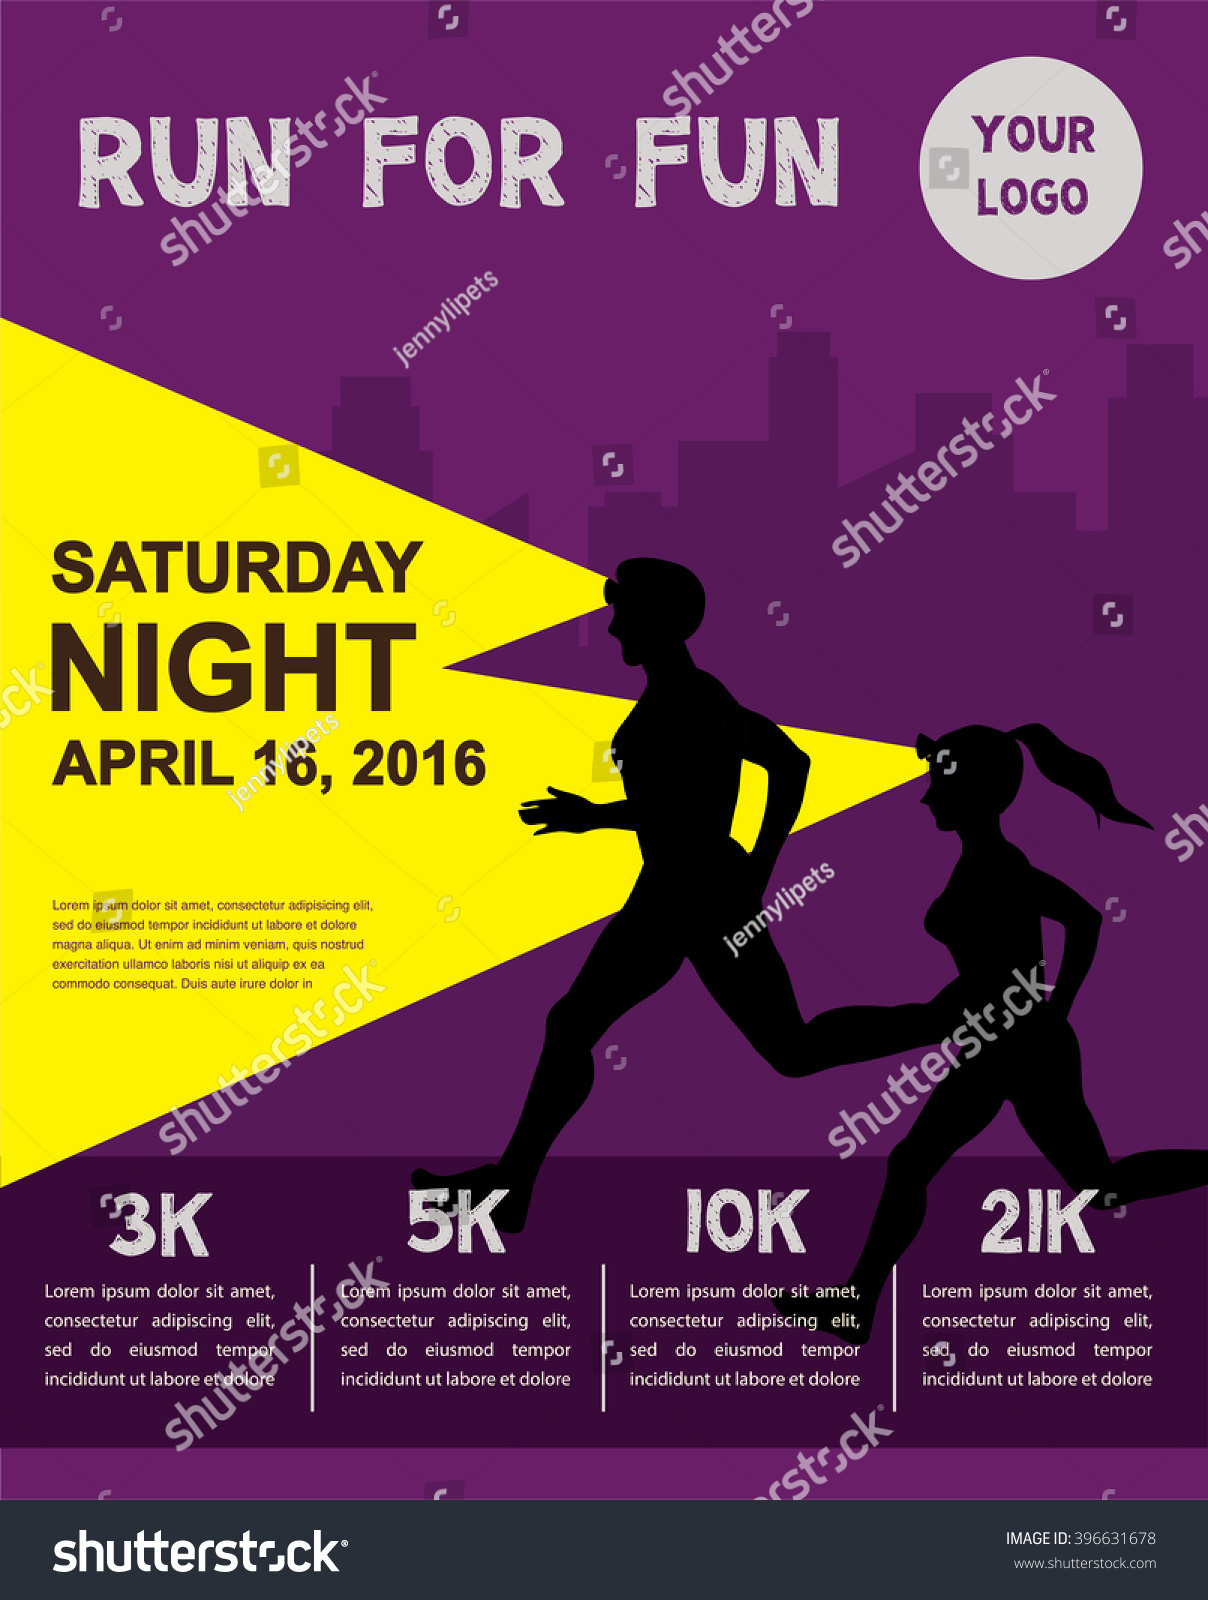 Zumba poster design - Night Running Marathon People Run Colorful Poster Design